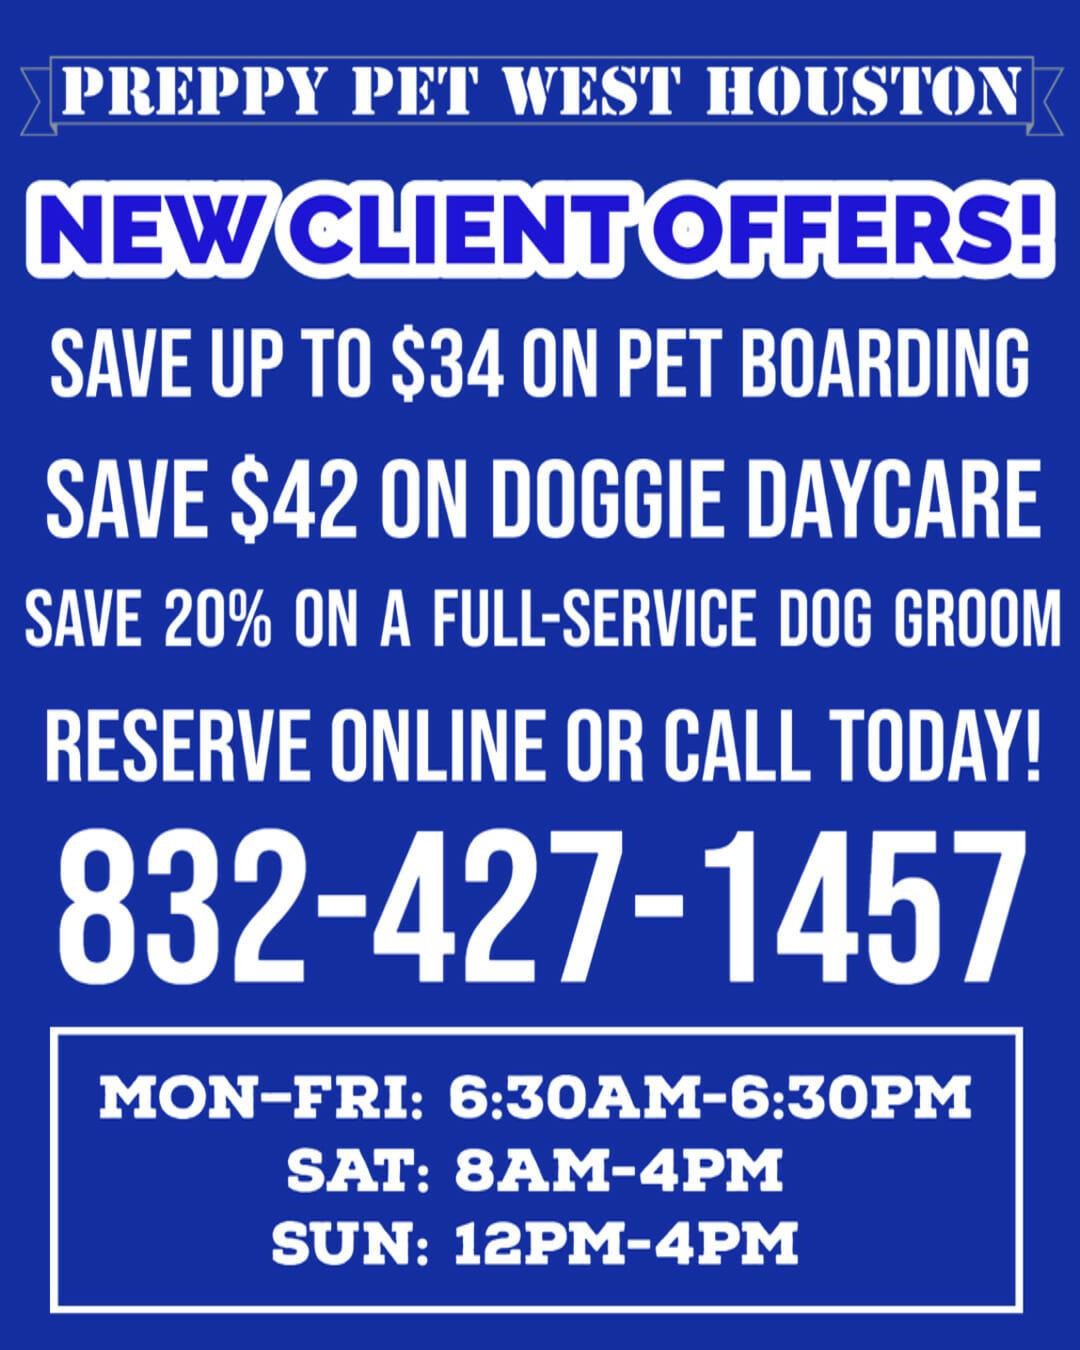 Preppy Pet West Houston Special Offers